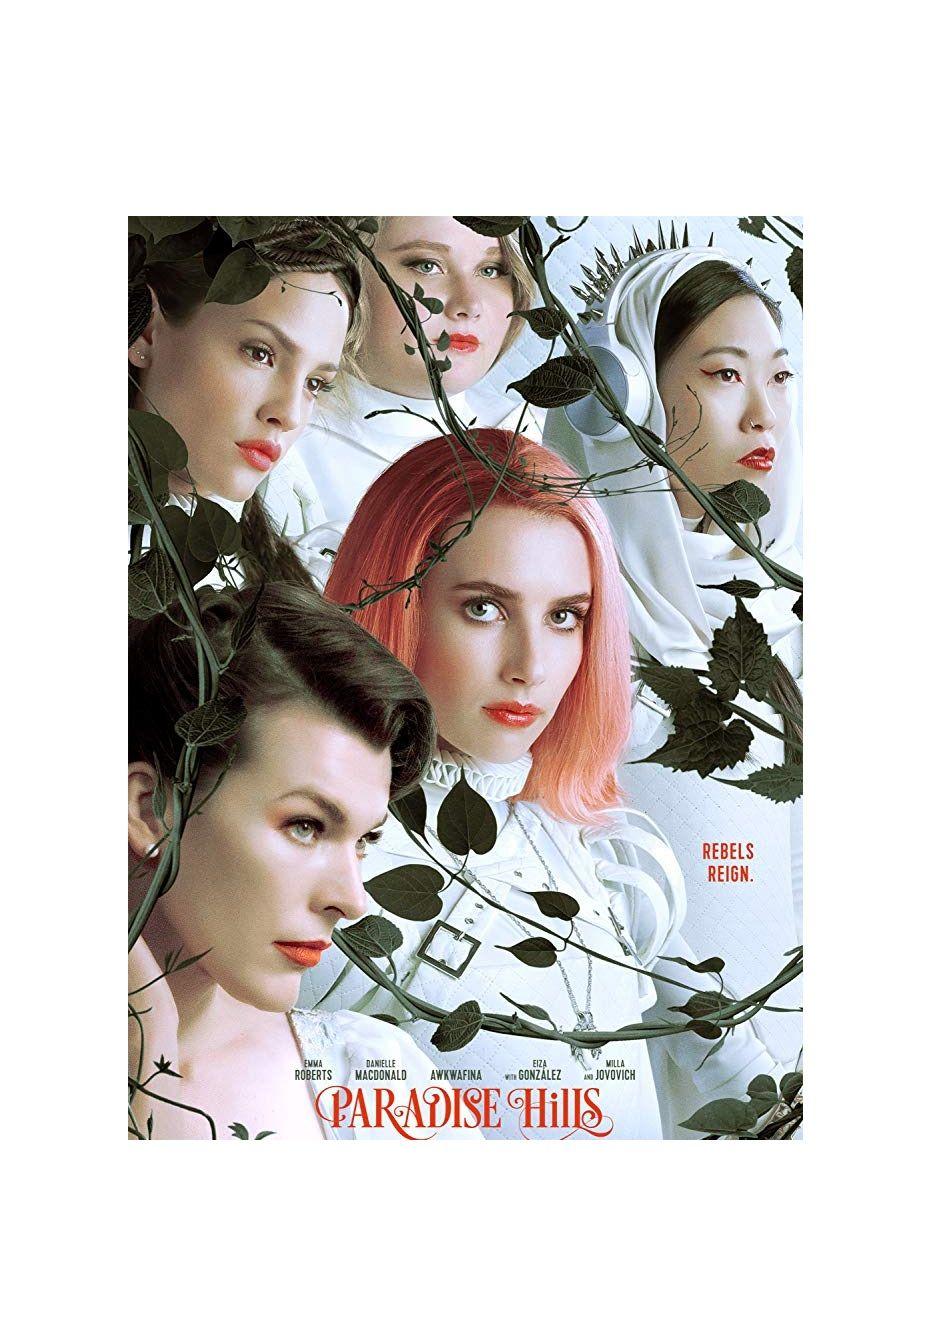 Paradise Hills 2019 Paradise Hills Eiza Gonzalez Milla Jovovich